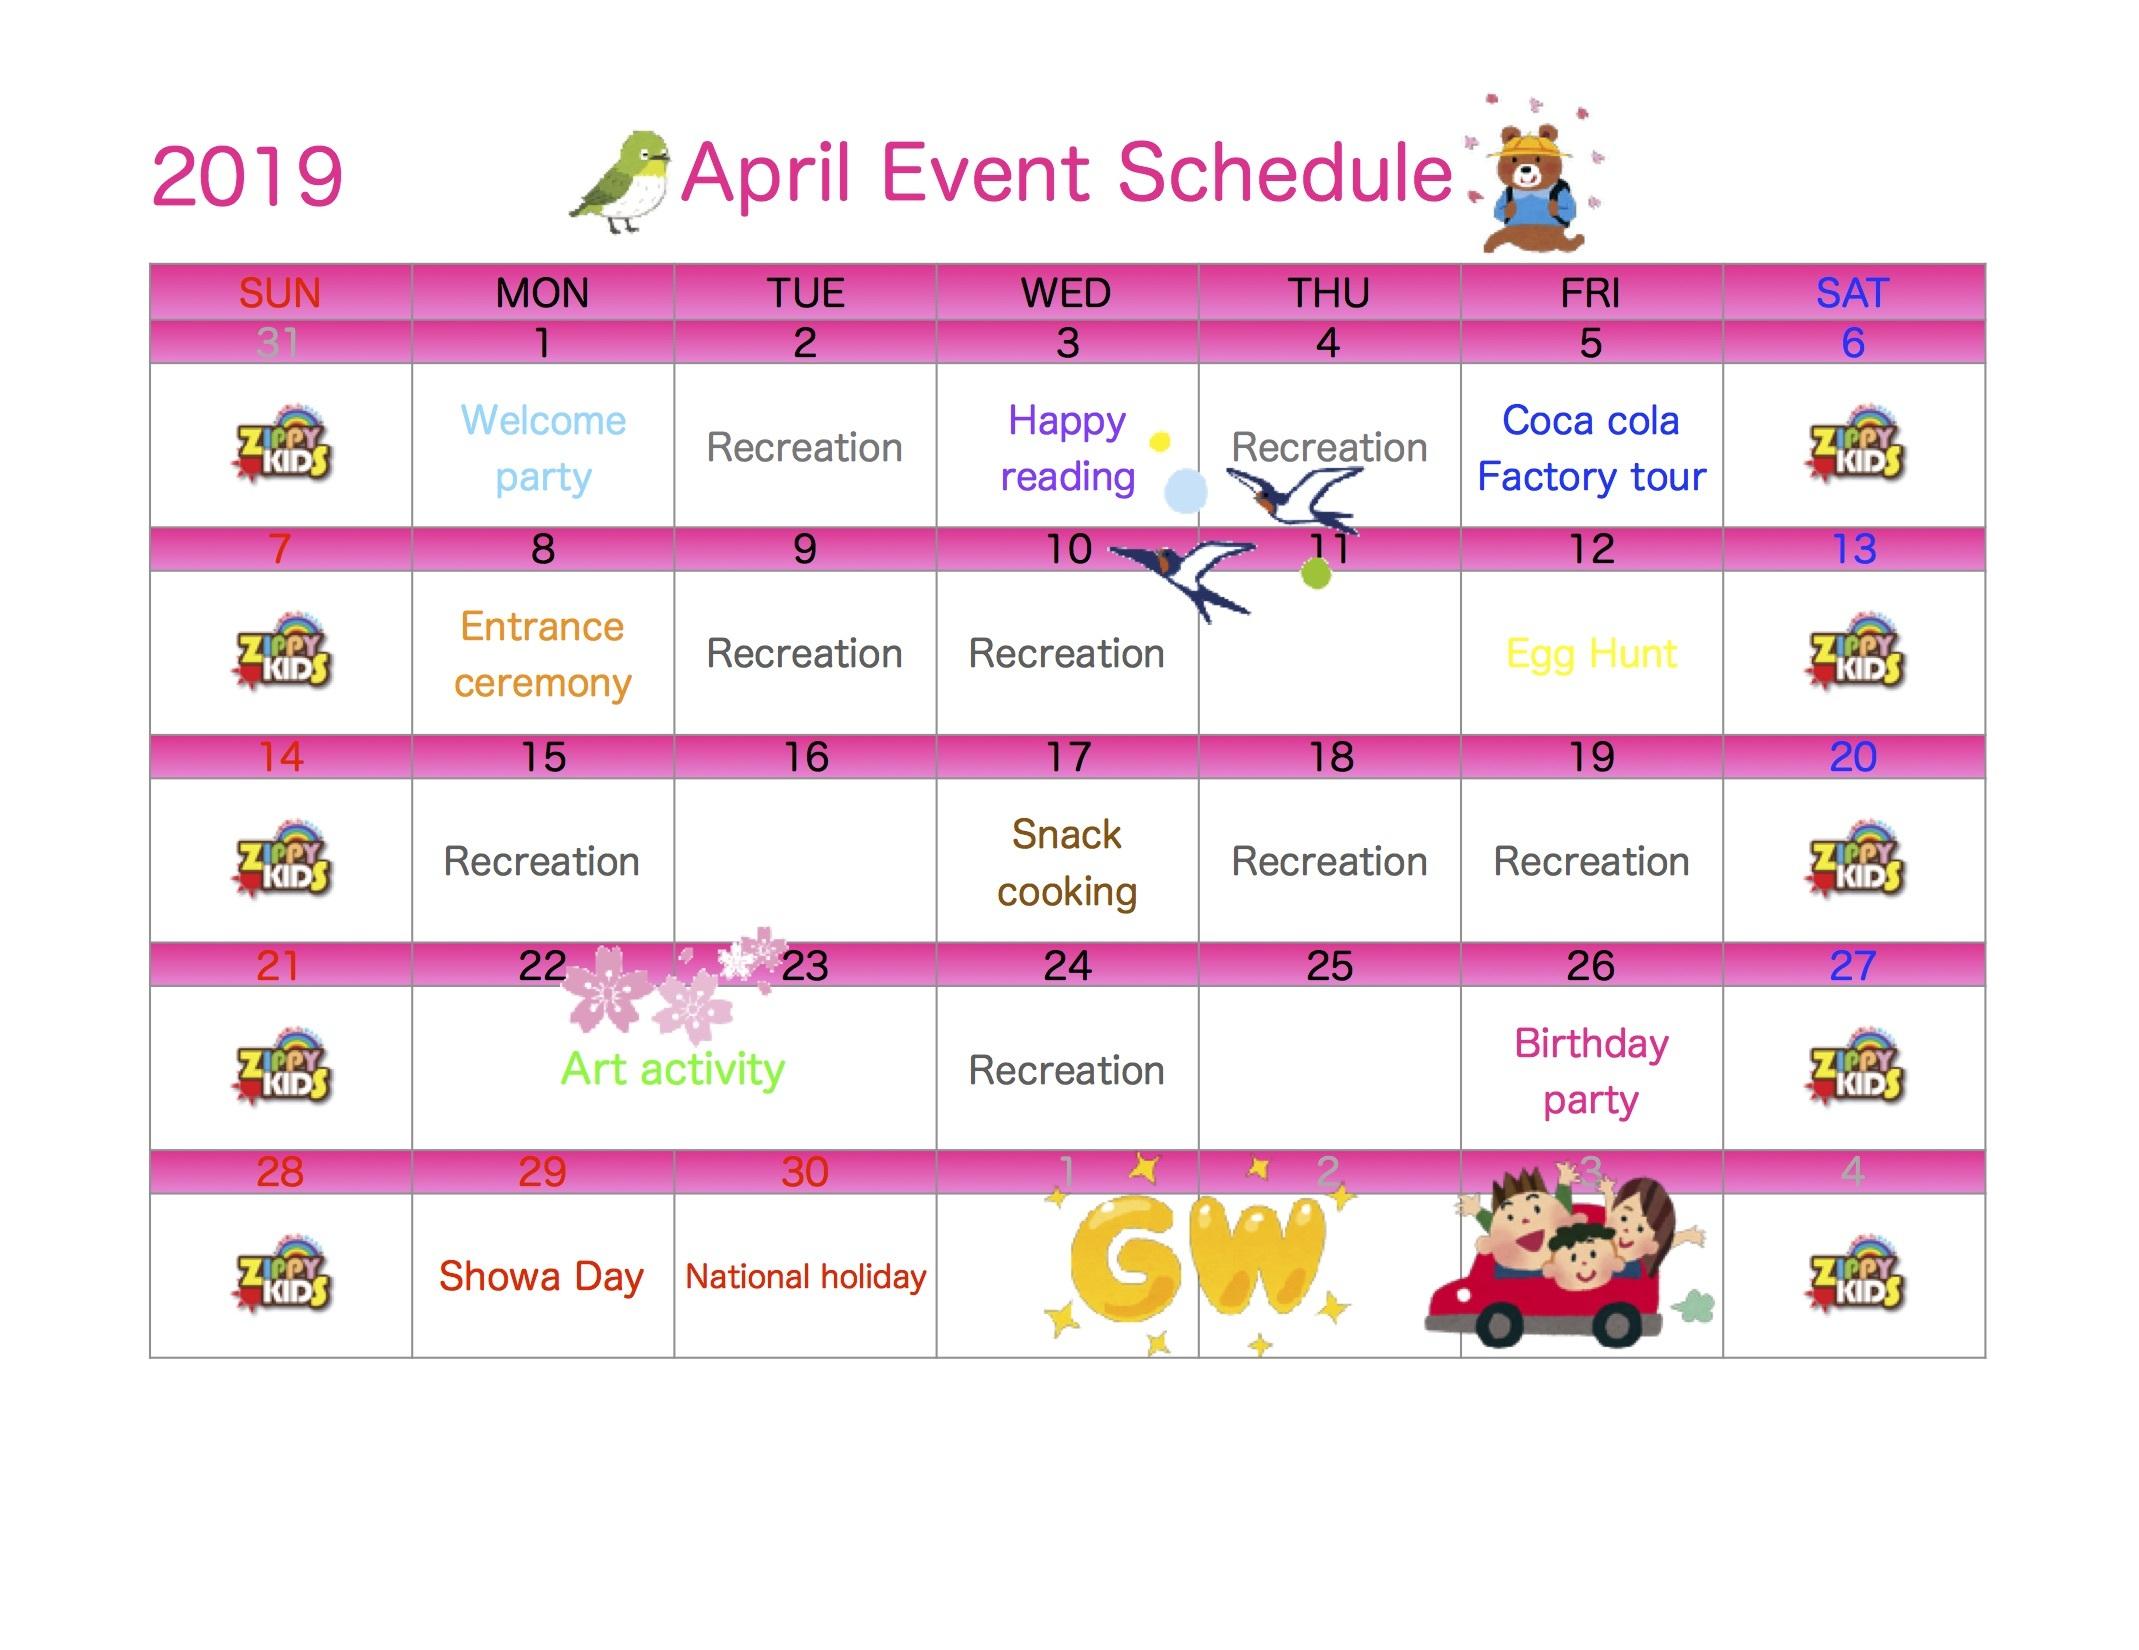 April Event Schedule_c0315908_10054516.jpg